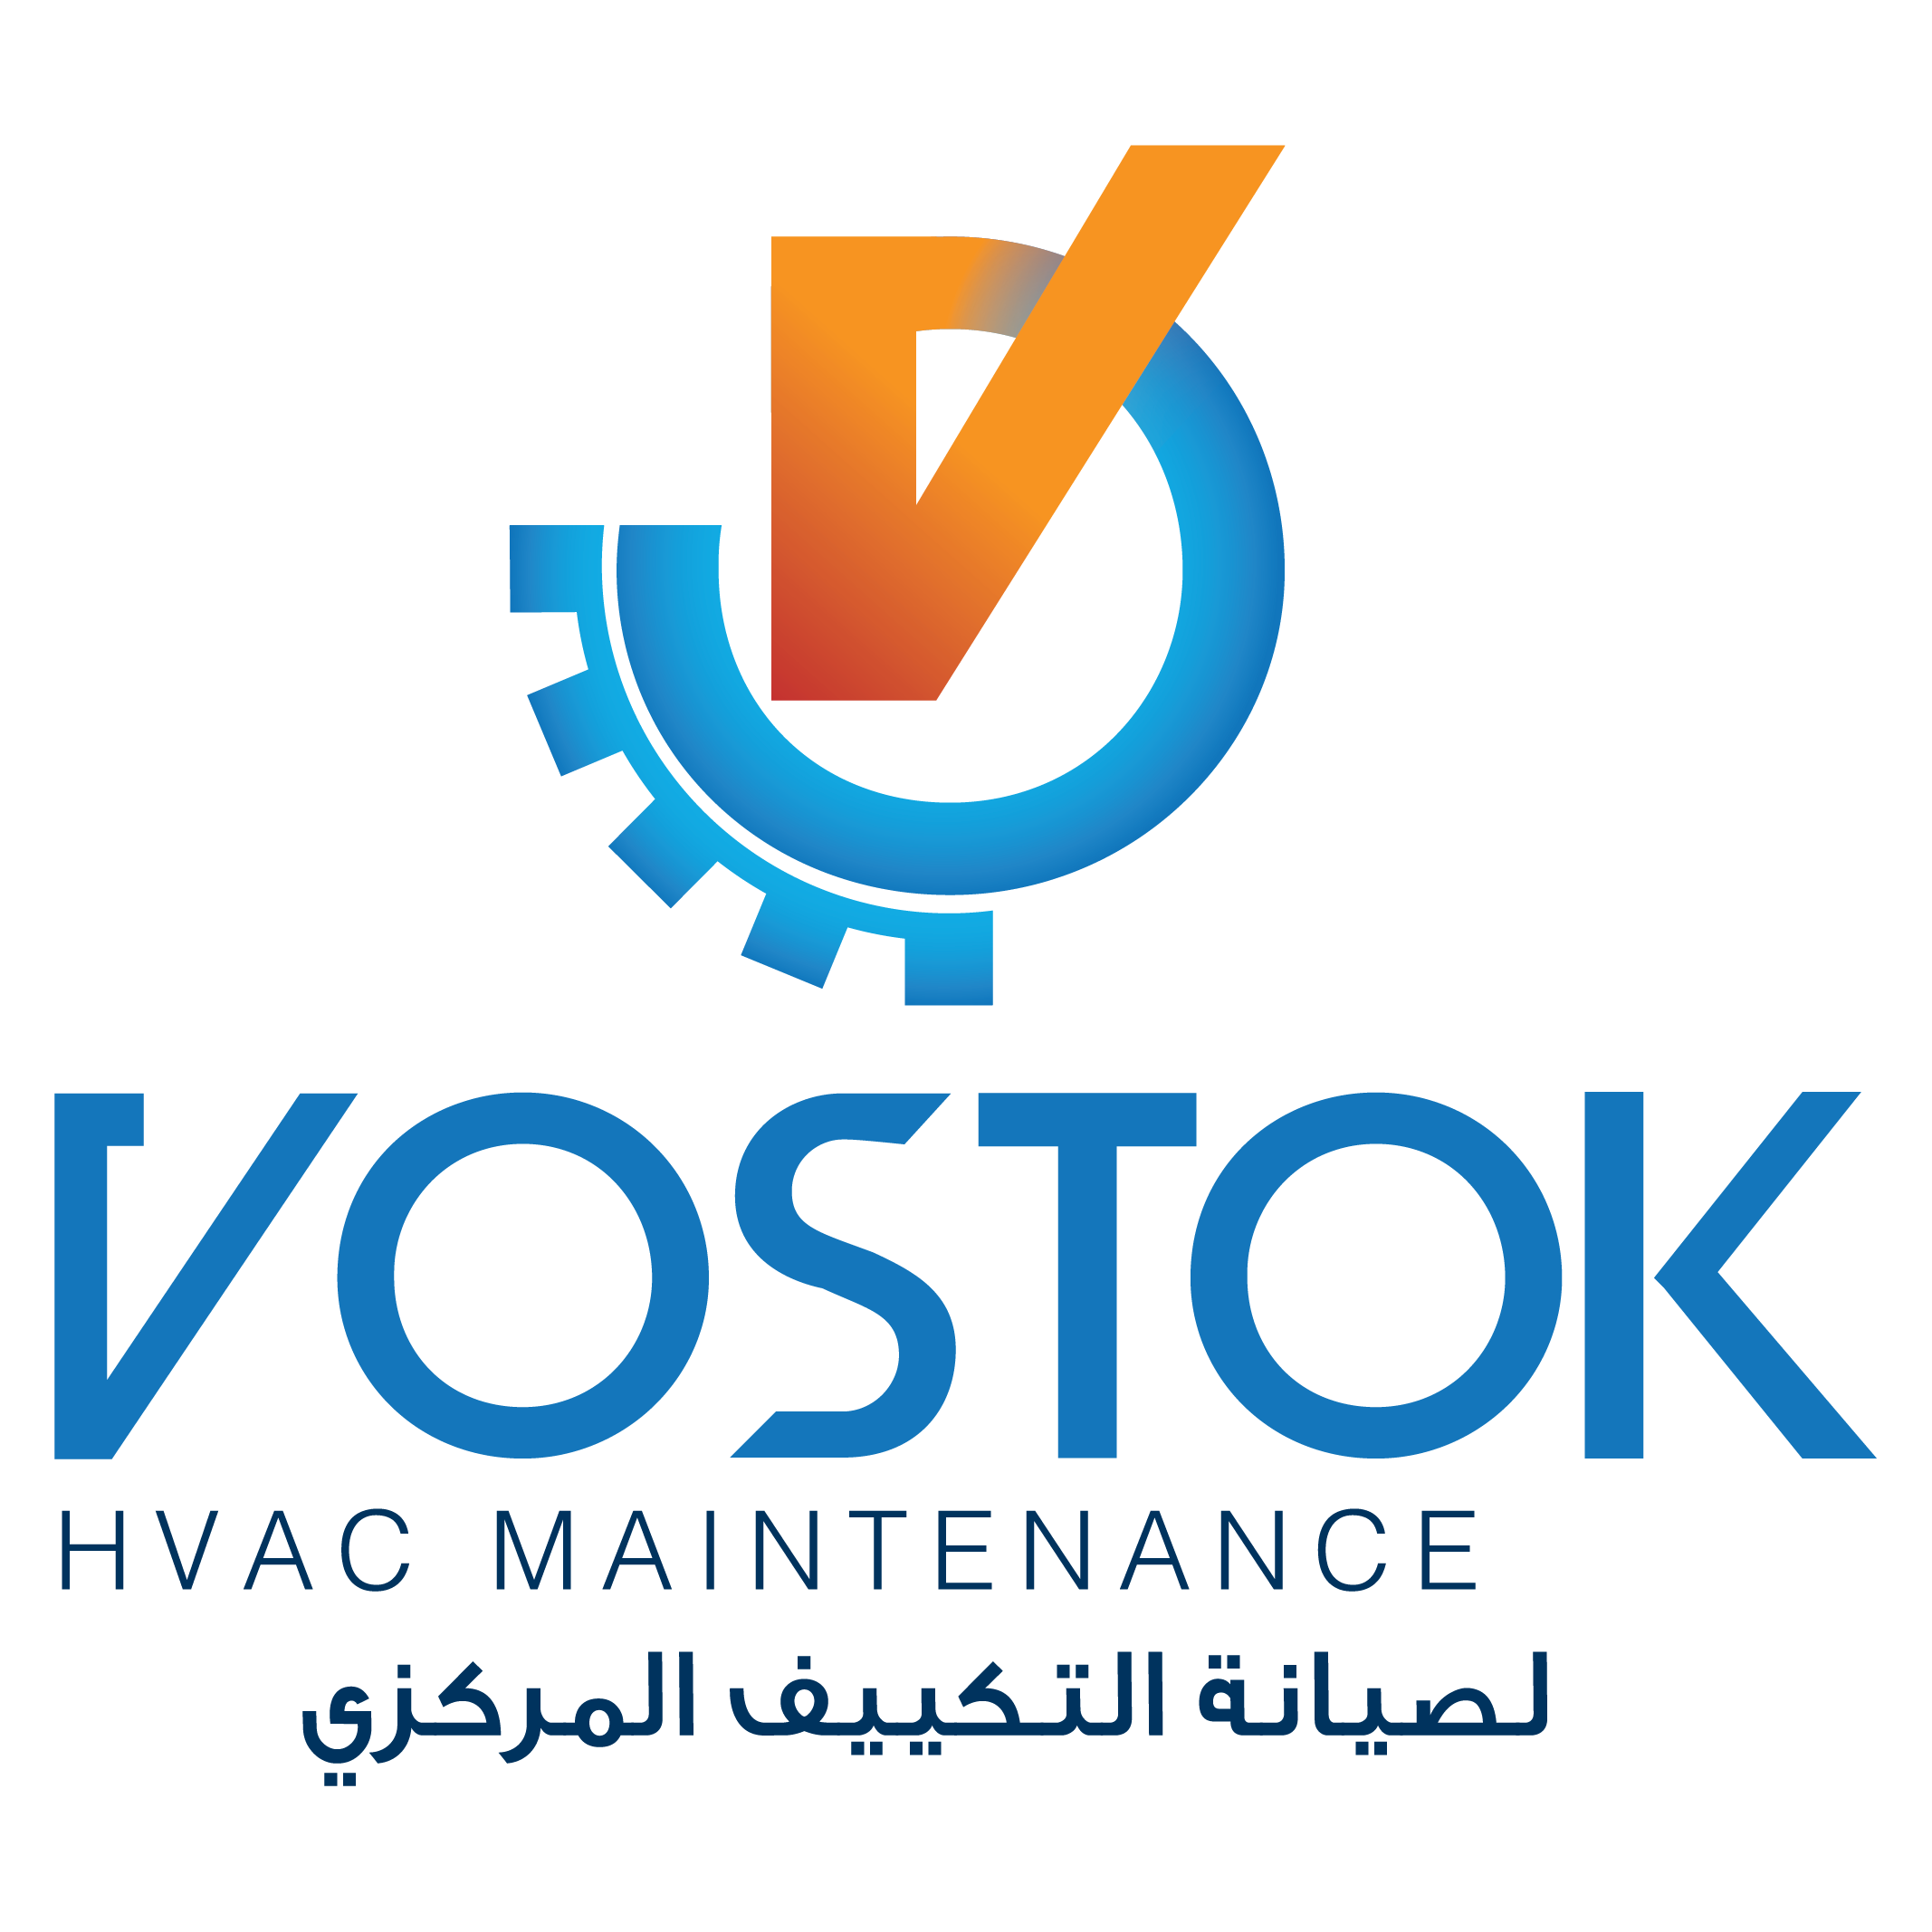 1984tech-1984inc-userexperience-partners-vostok-hvac-design-ux-ui-kuwait